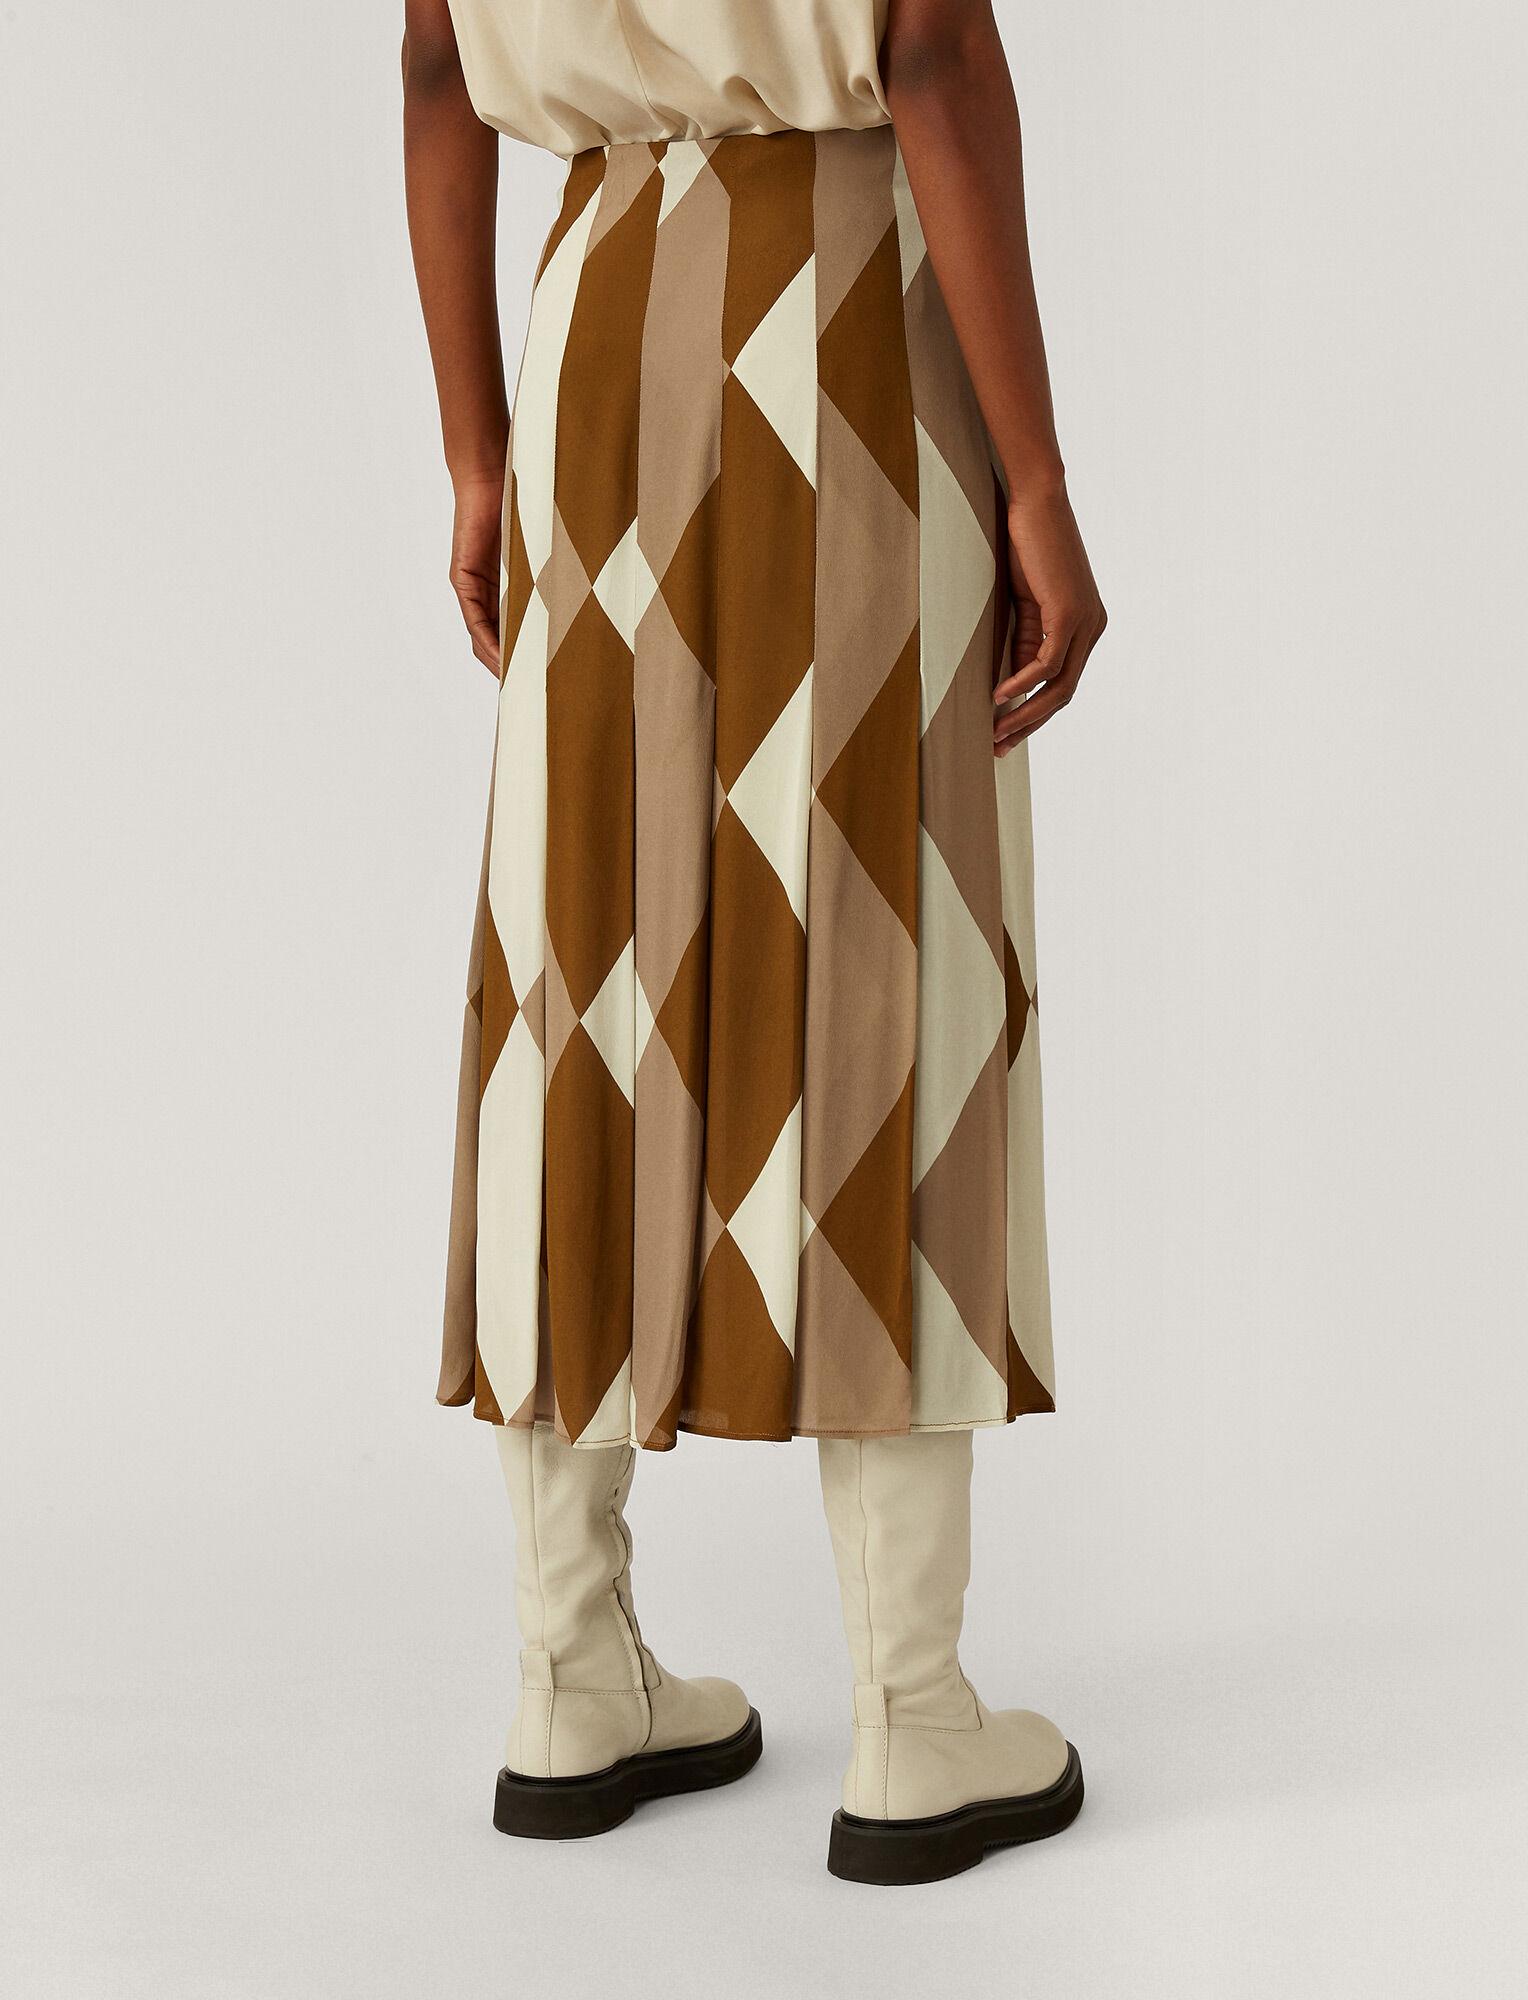 Joseph, Saria Argyle Print Skirt, in Cumin